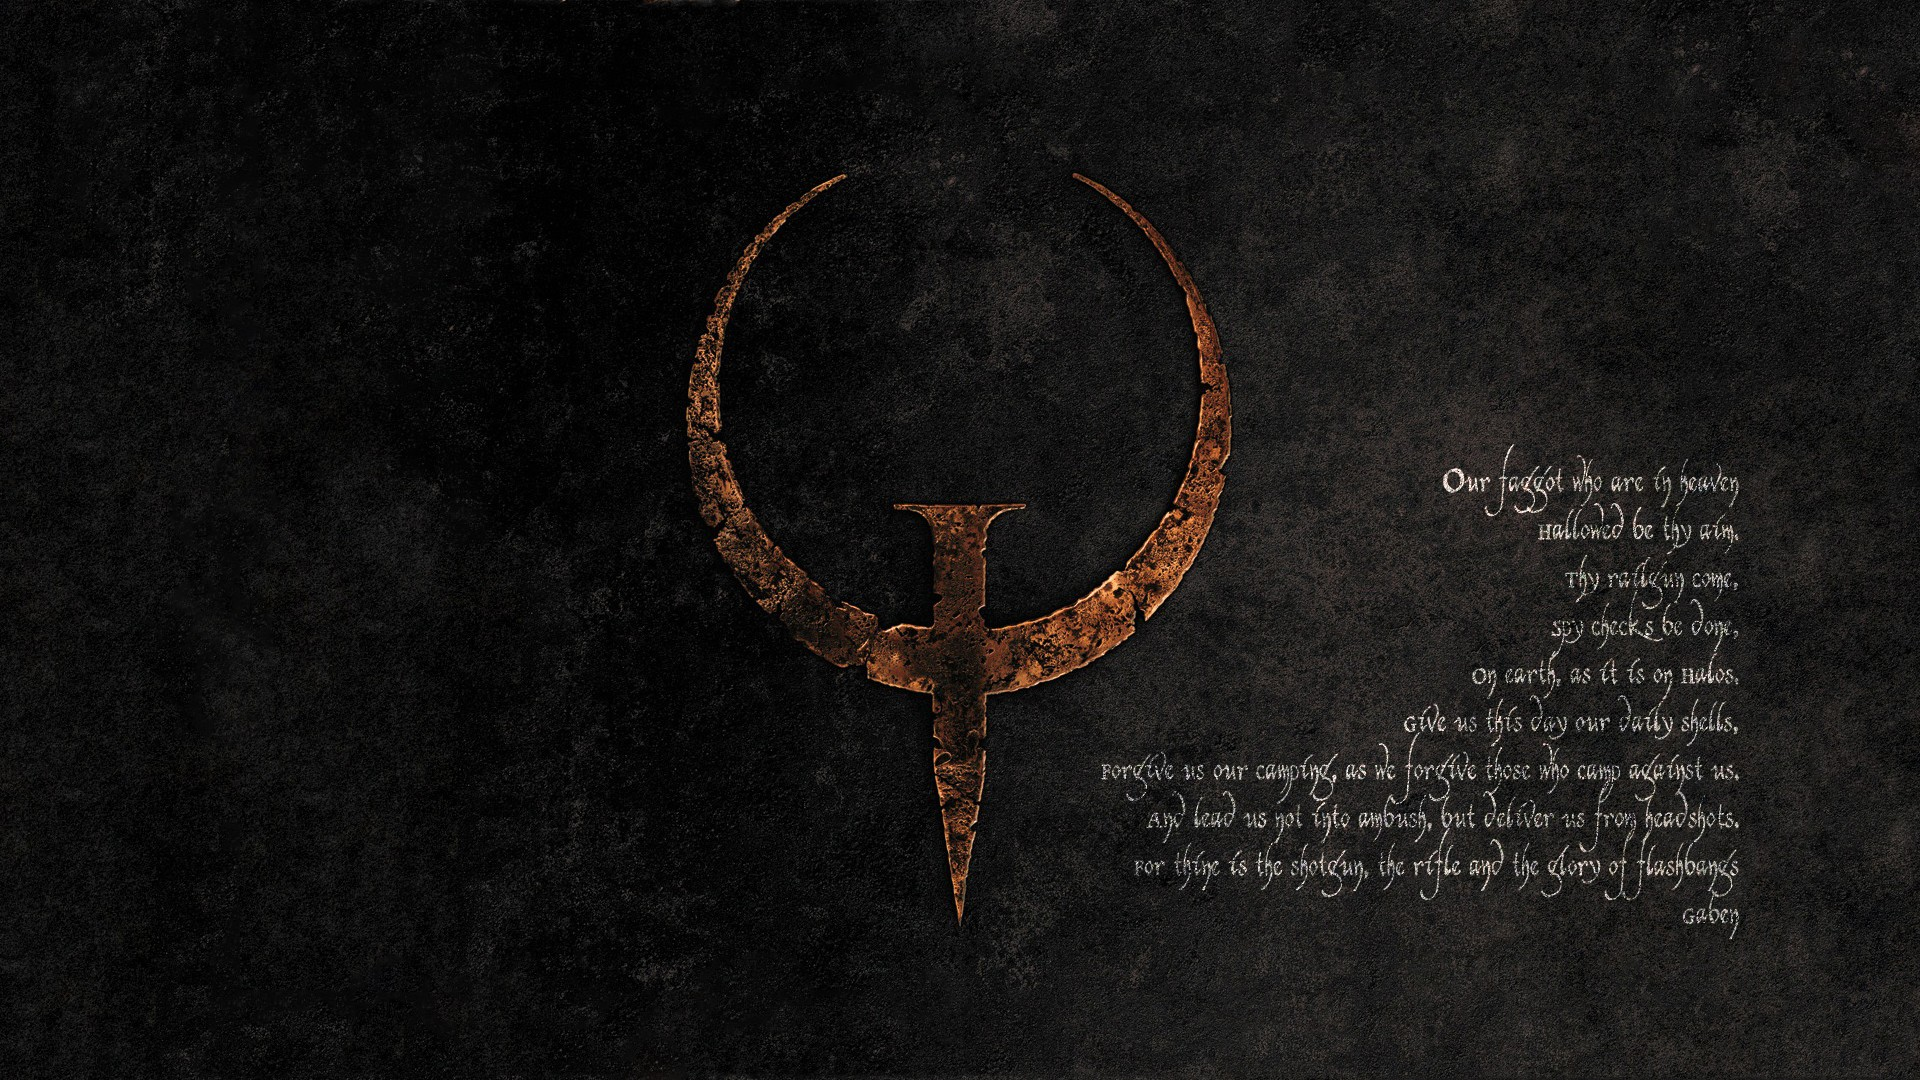 Quake Wallpaper 1920x1080 Quake 1920x1080